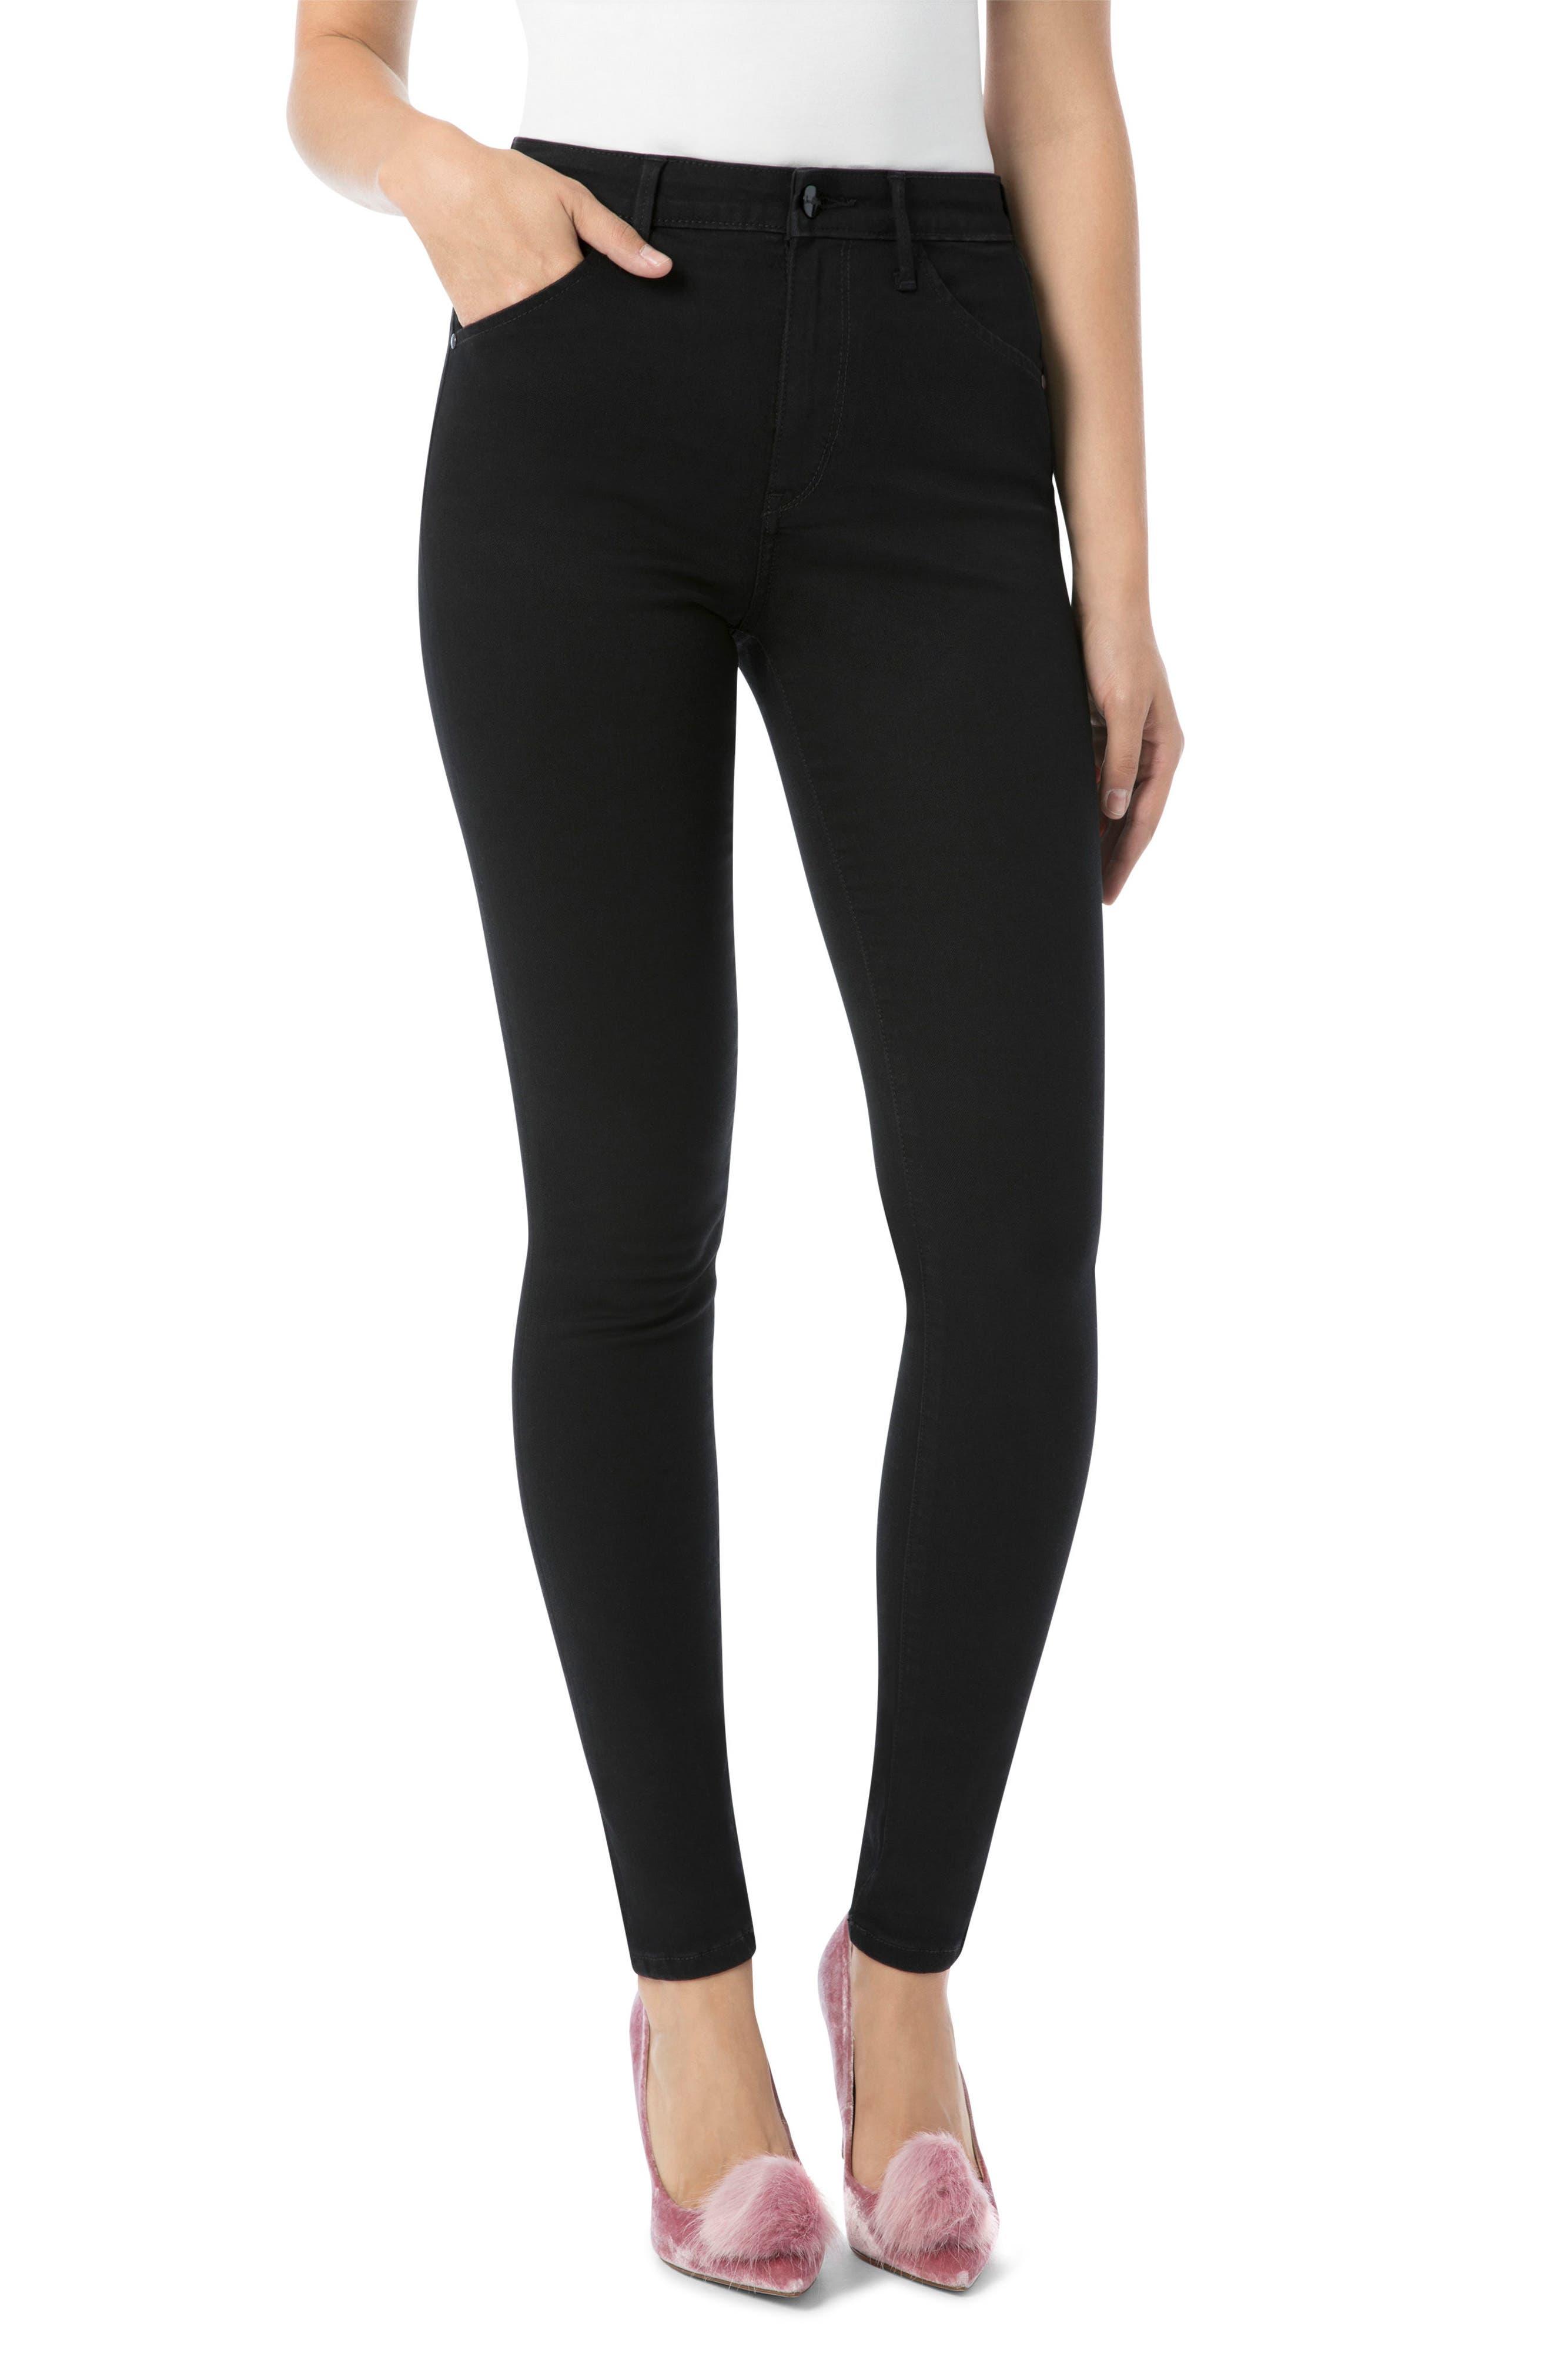 Alternate Image 1 Selected - Sam Edelman Stiletto High Rise Skinny Jeans (Ambrose)